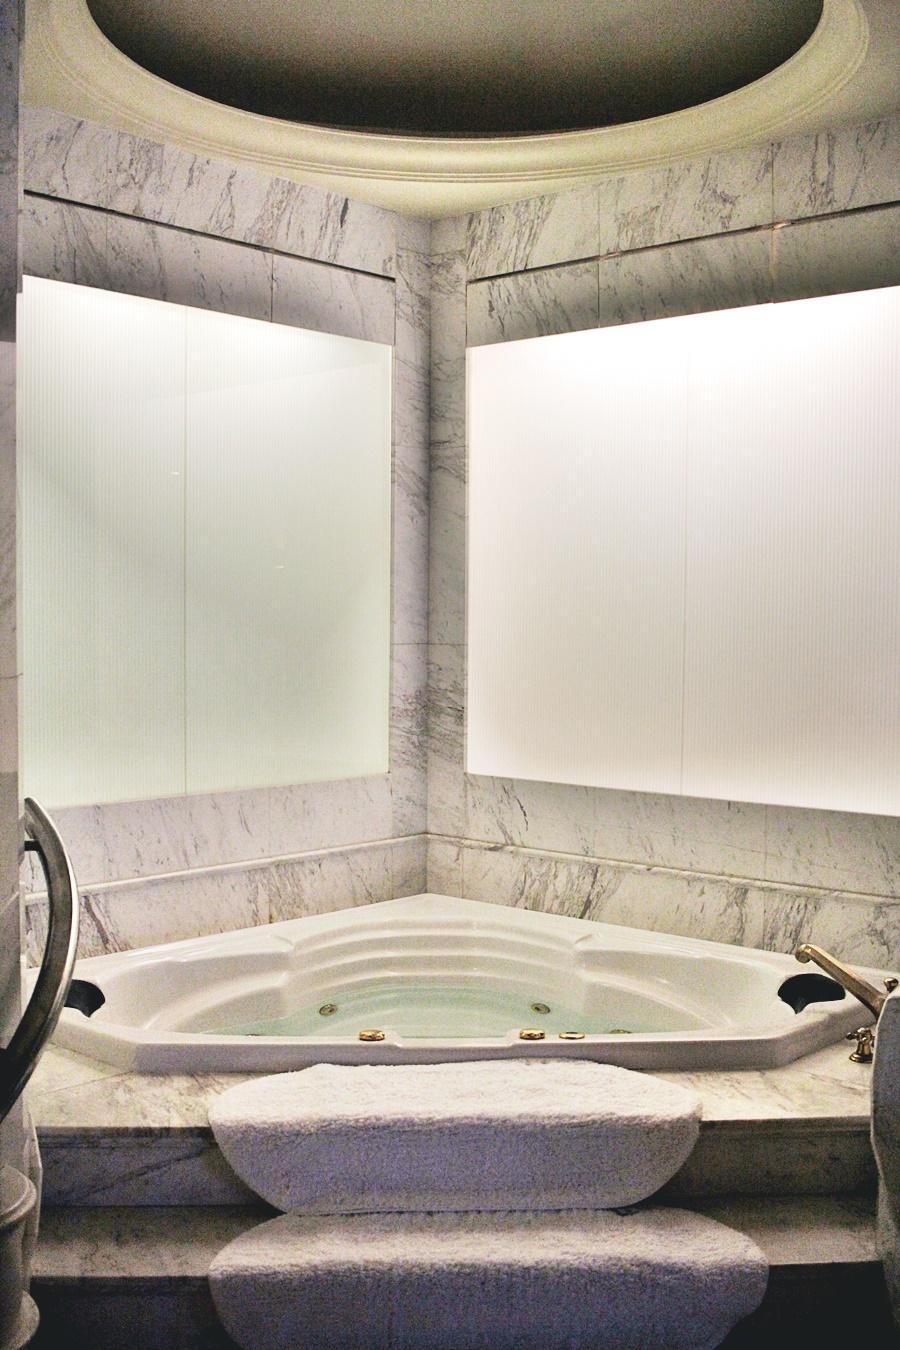 whirlpool luxury spa